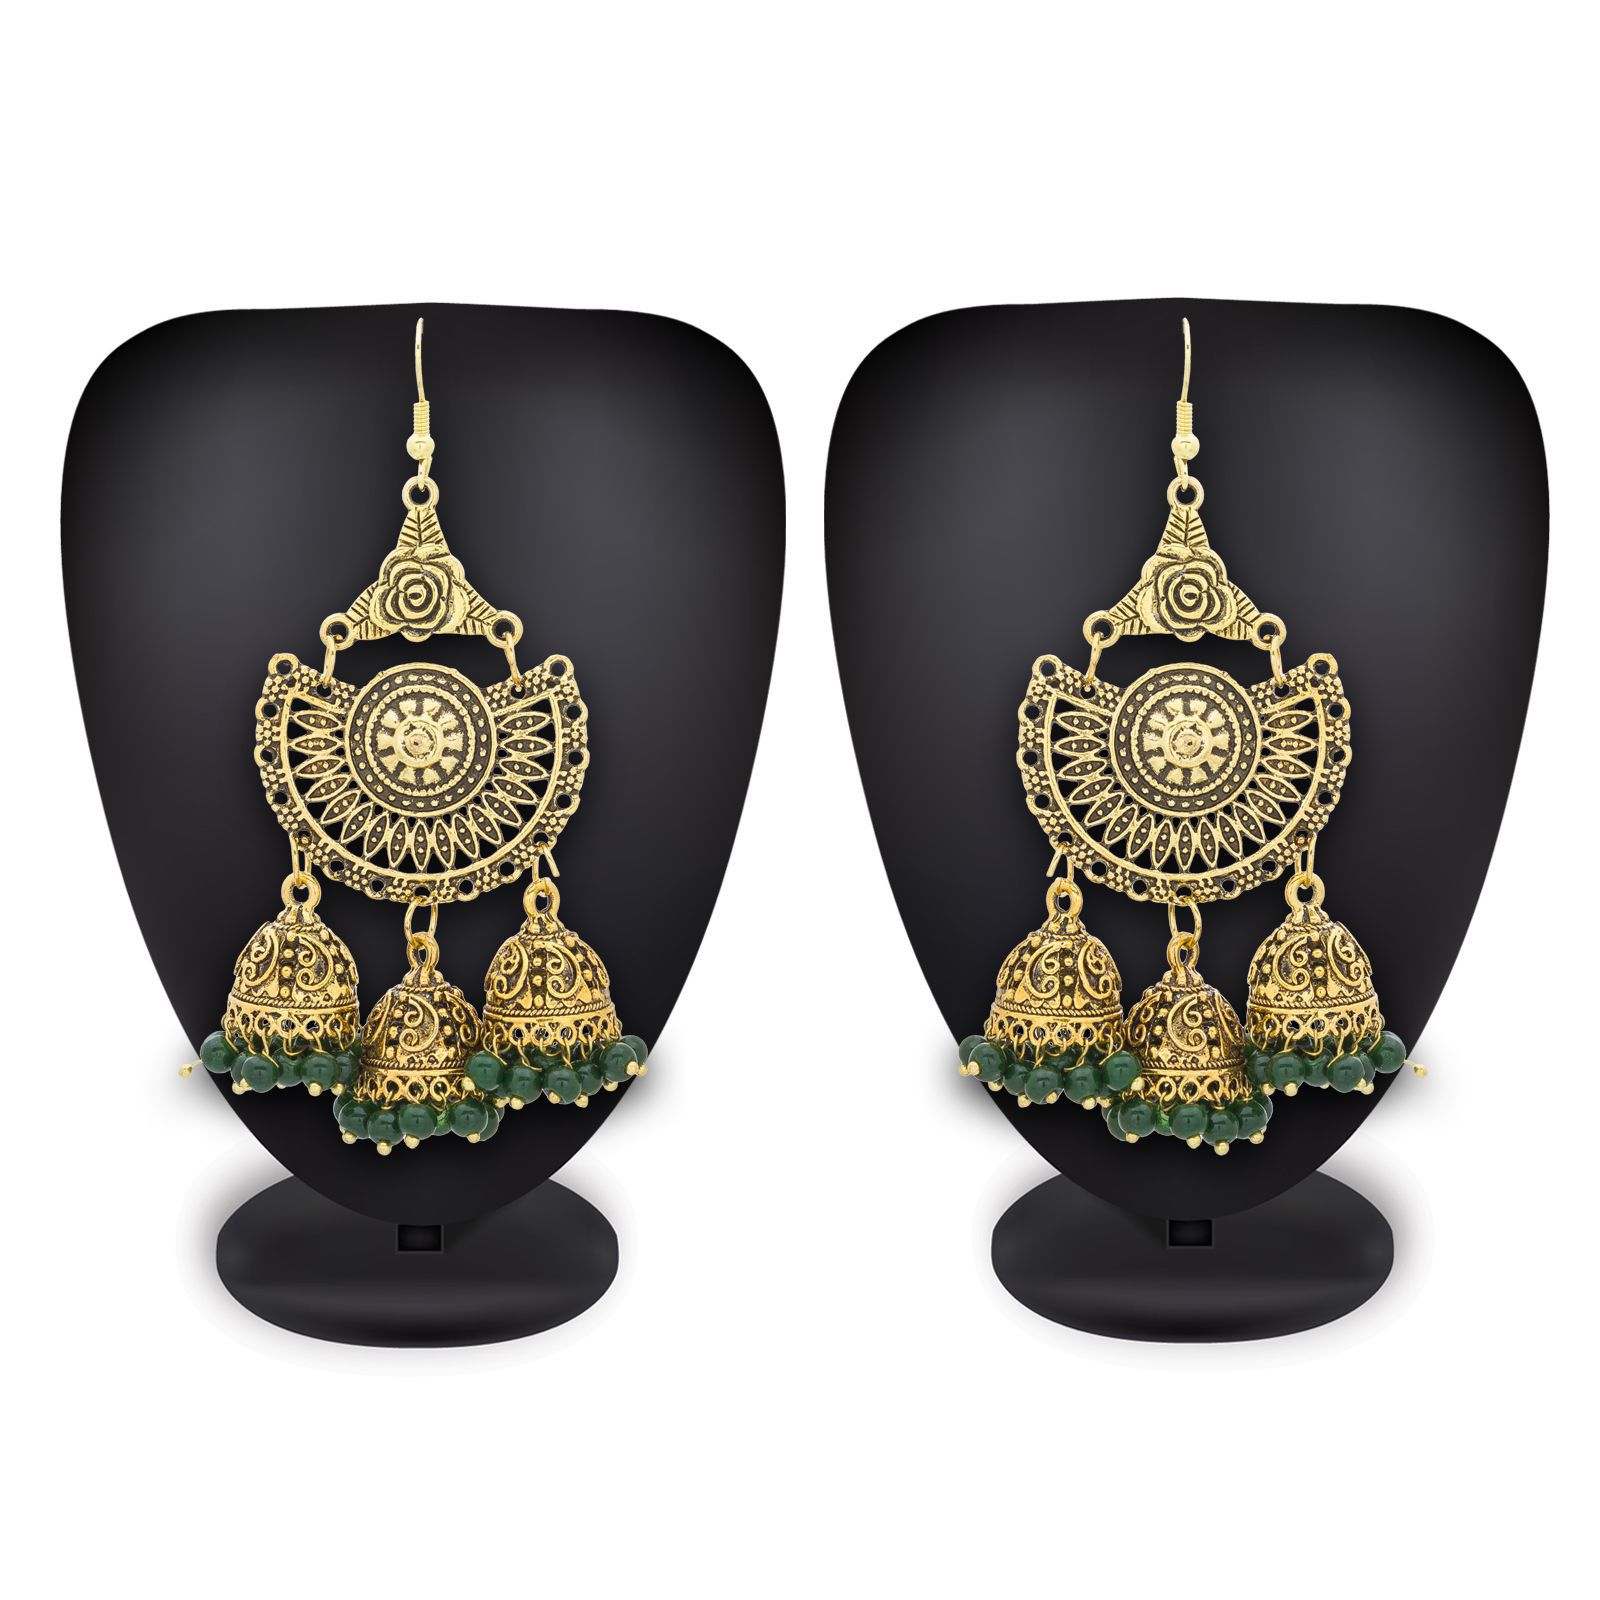 Aadita Ethnic Traditional Gold Plated Alloy Hanging Jhumki Chandbali American Diamond and Pearl Earrings for Women